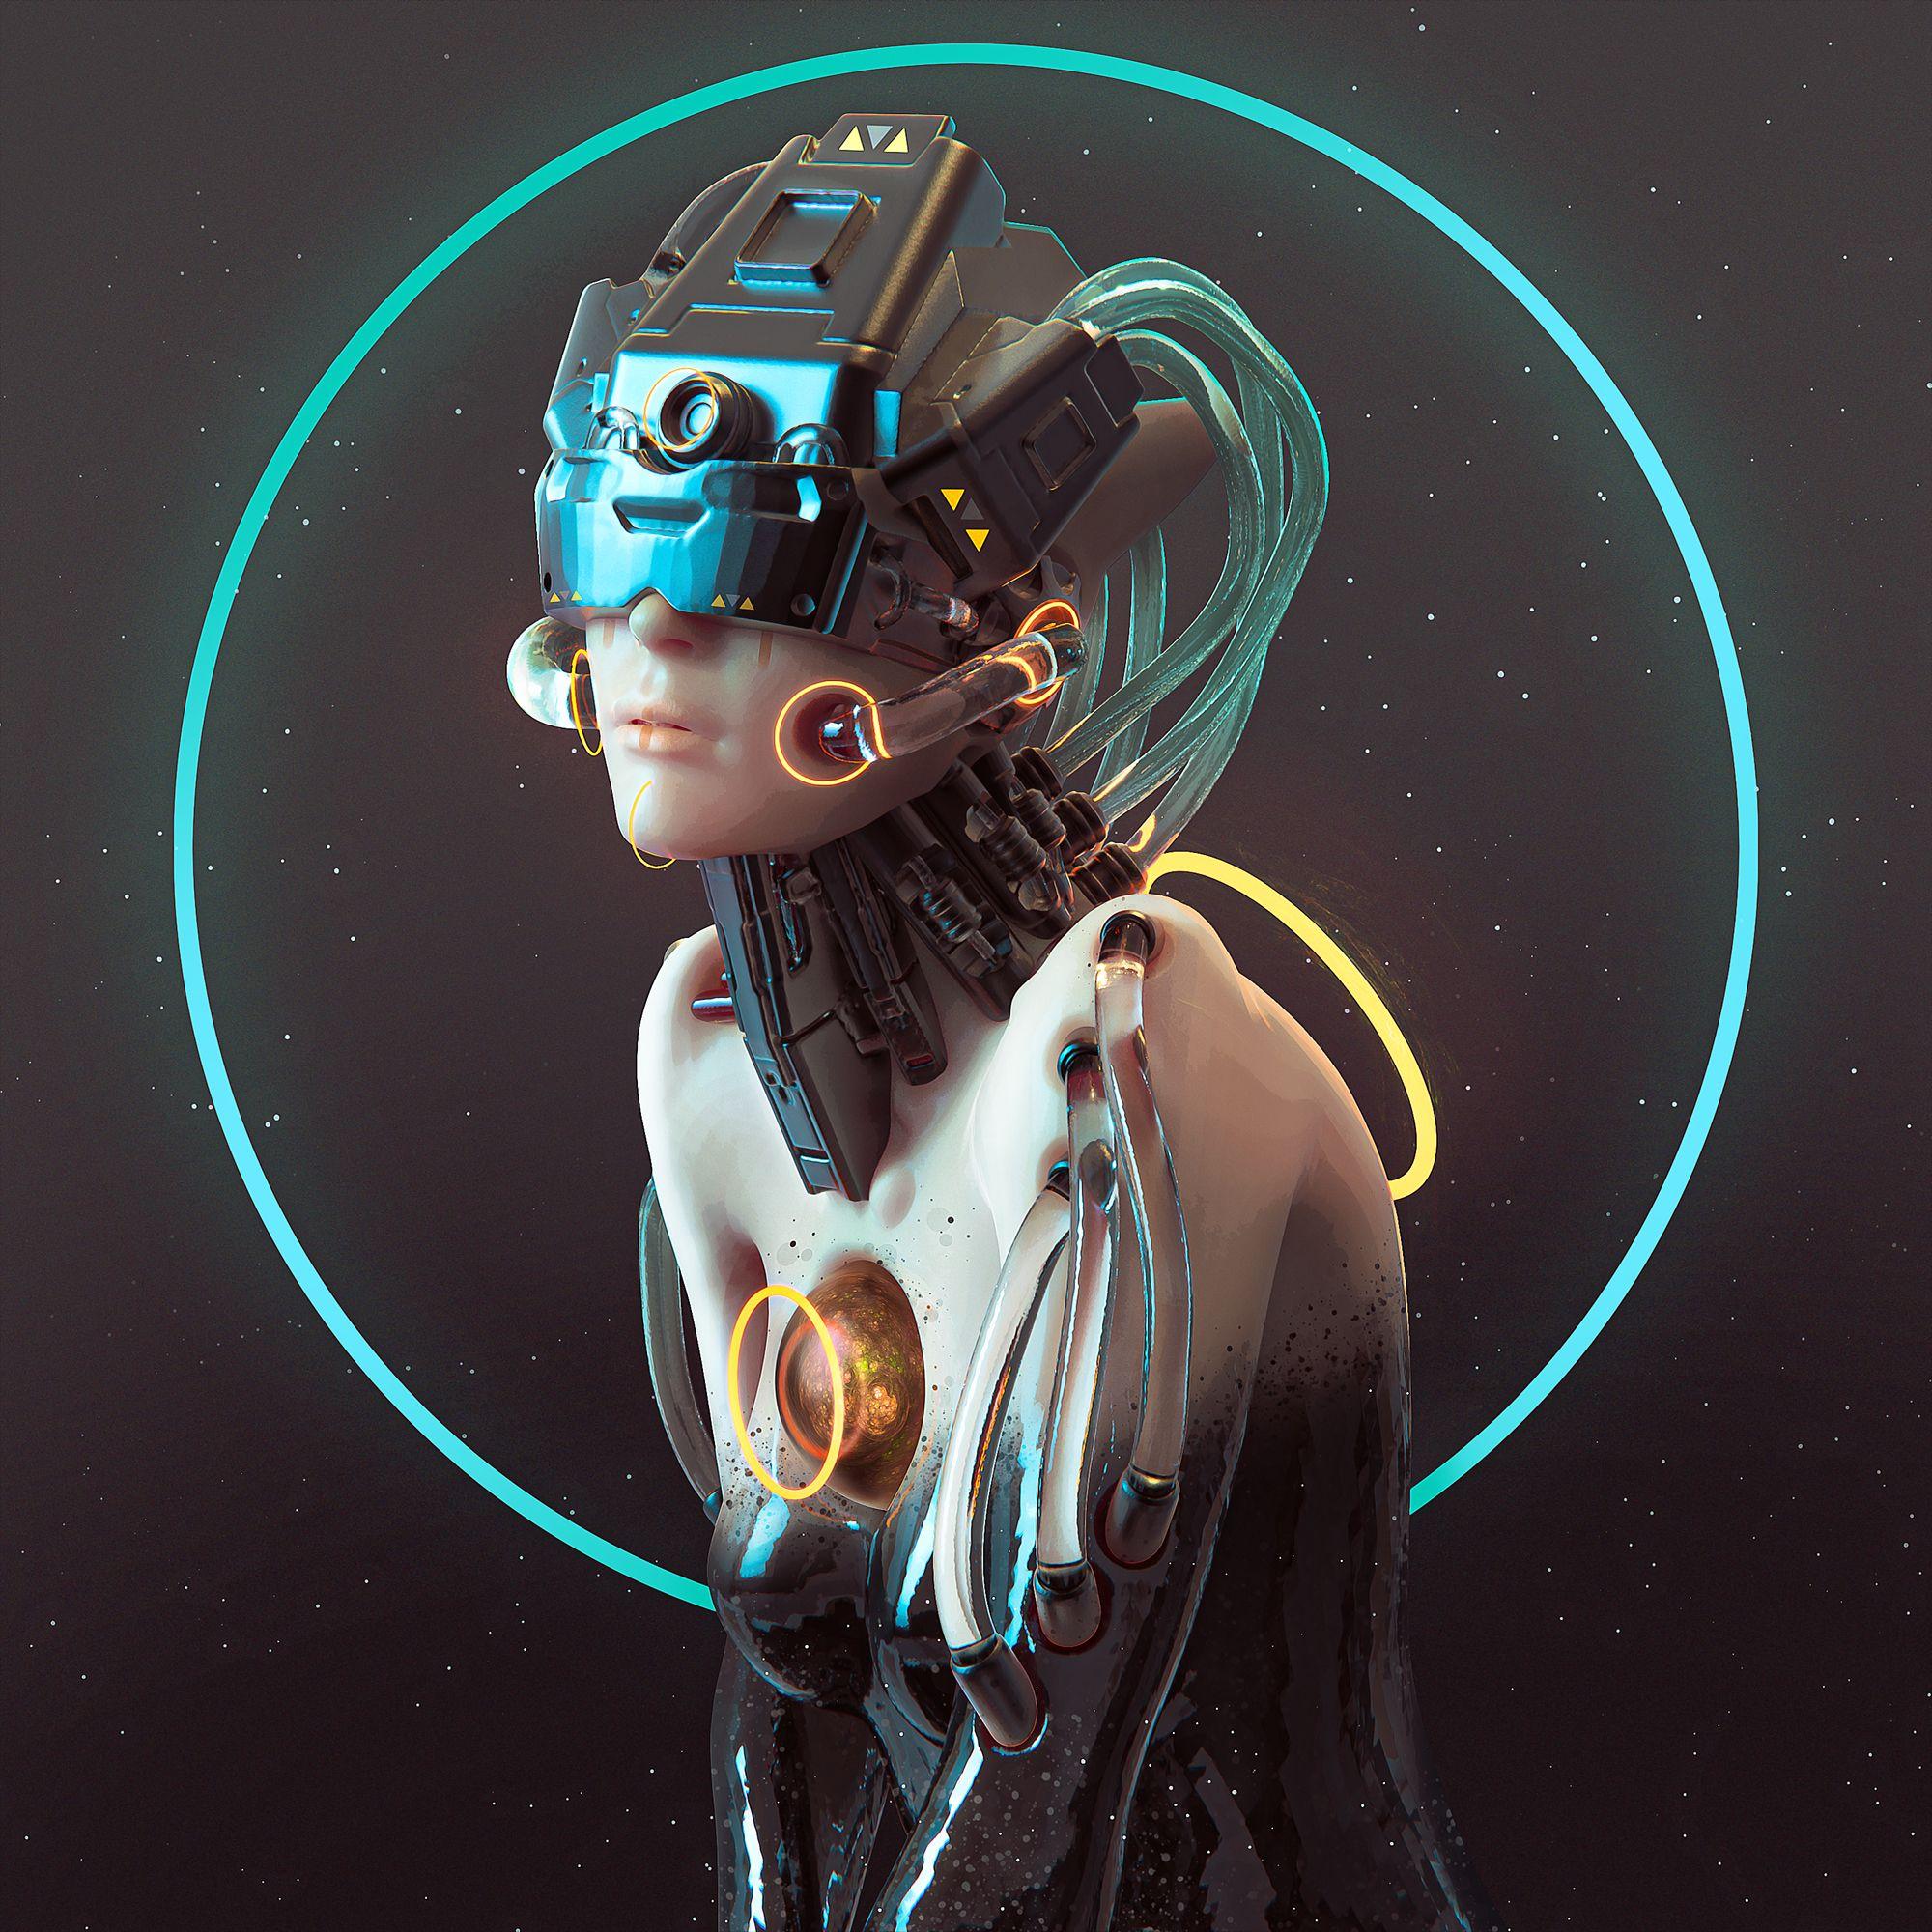 Future Girl in 2020 Cyberpunk girl, What is